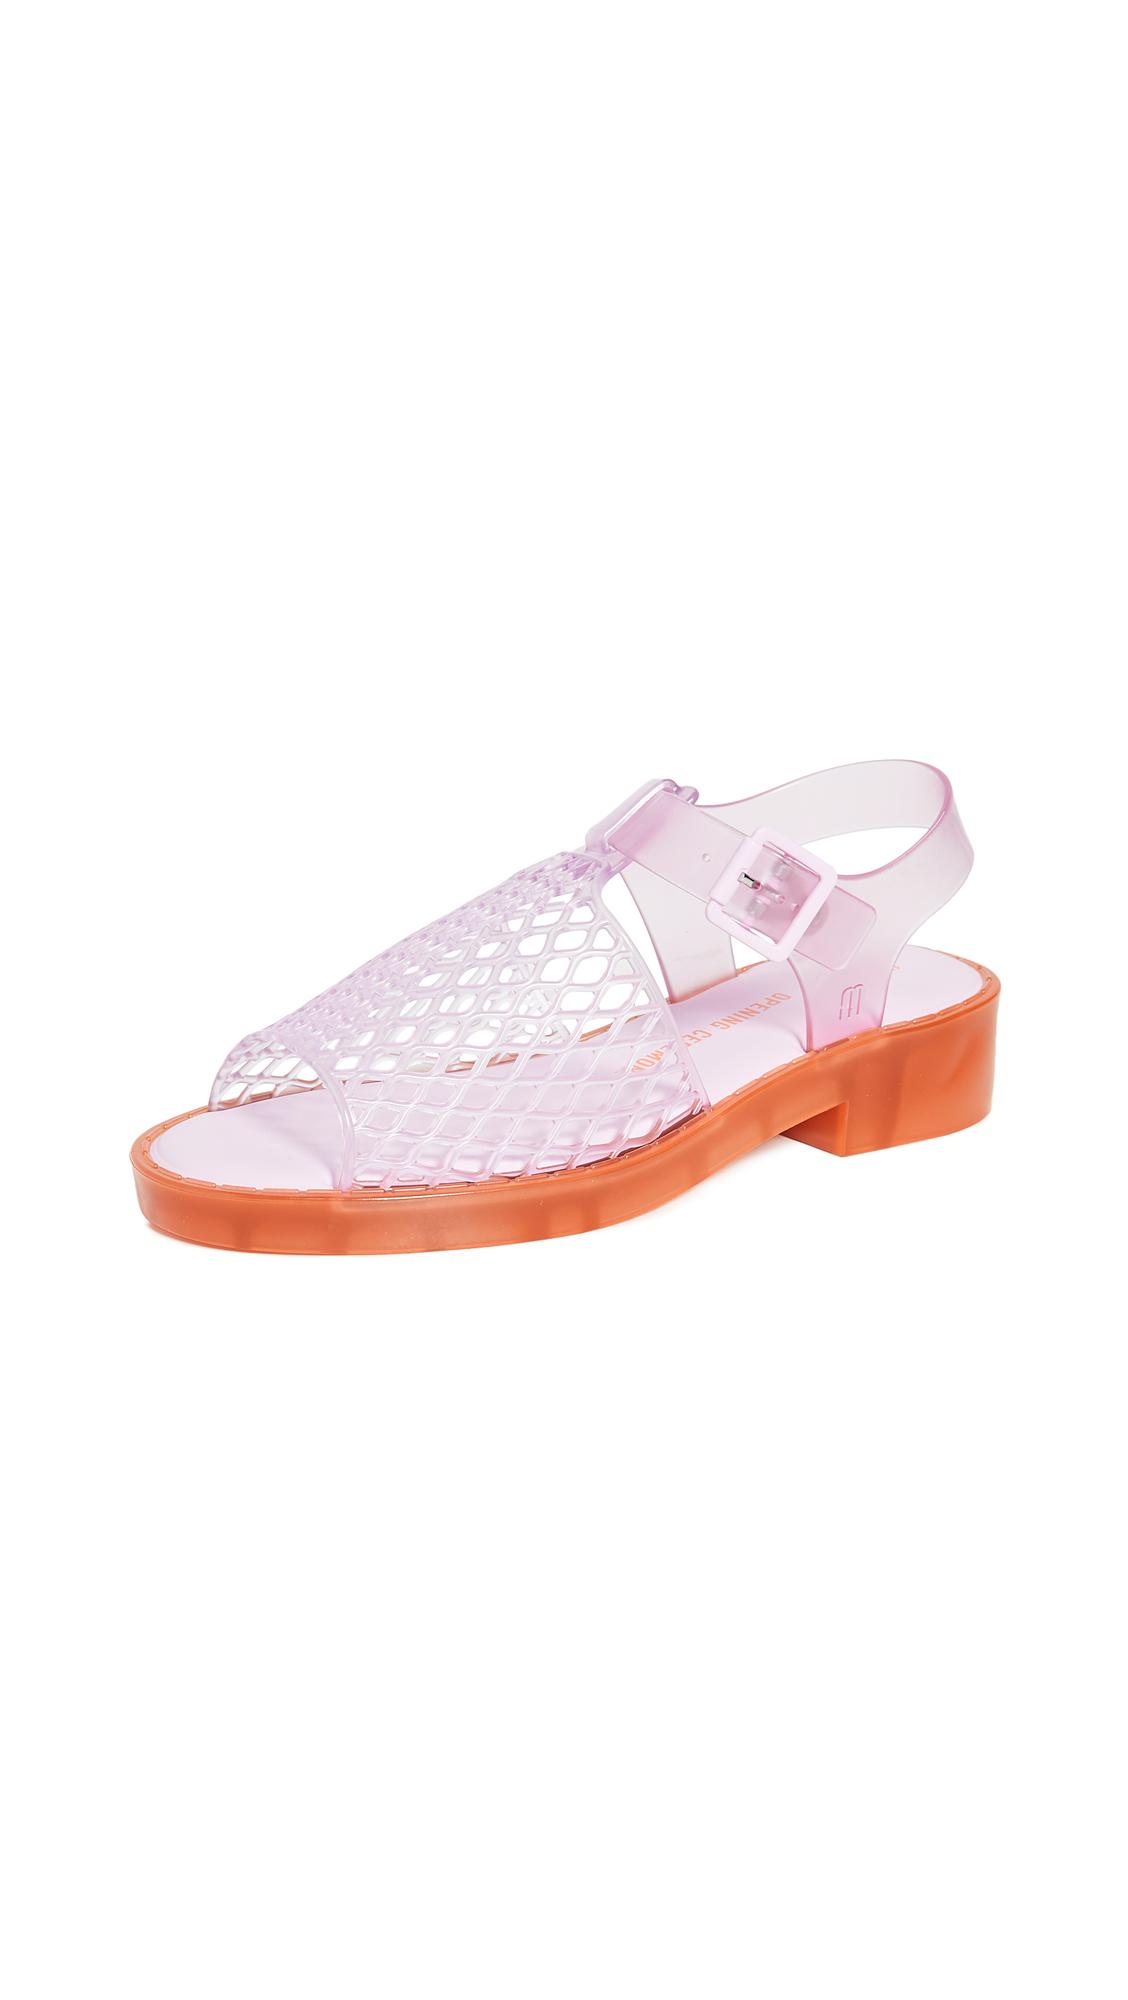 Buy Melissa X Opening Ceremony Hatch Sandals online, shop Melissa